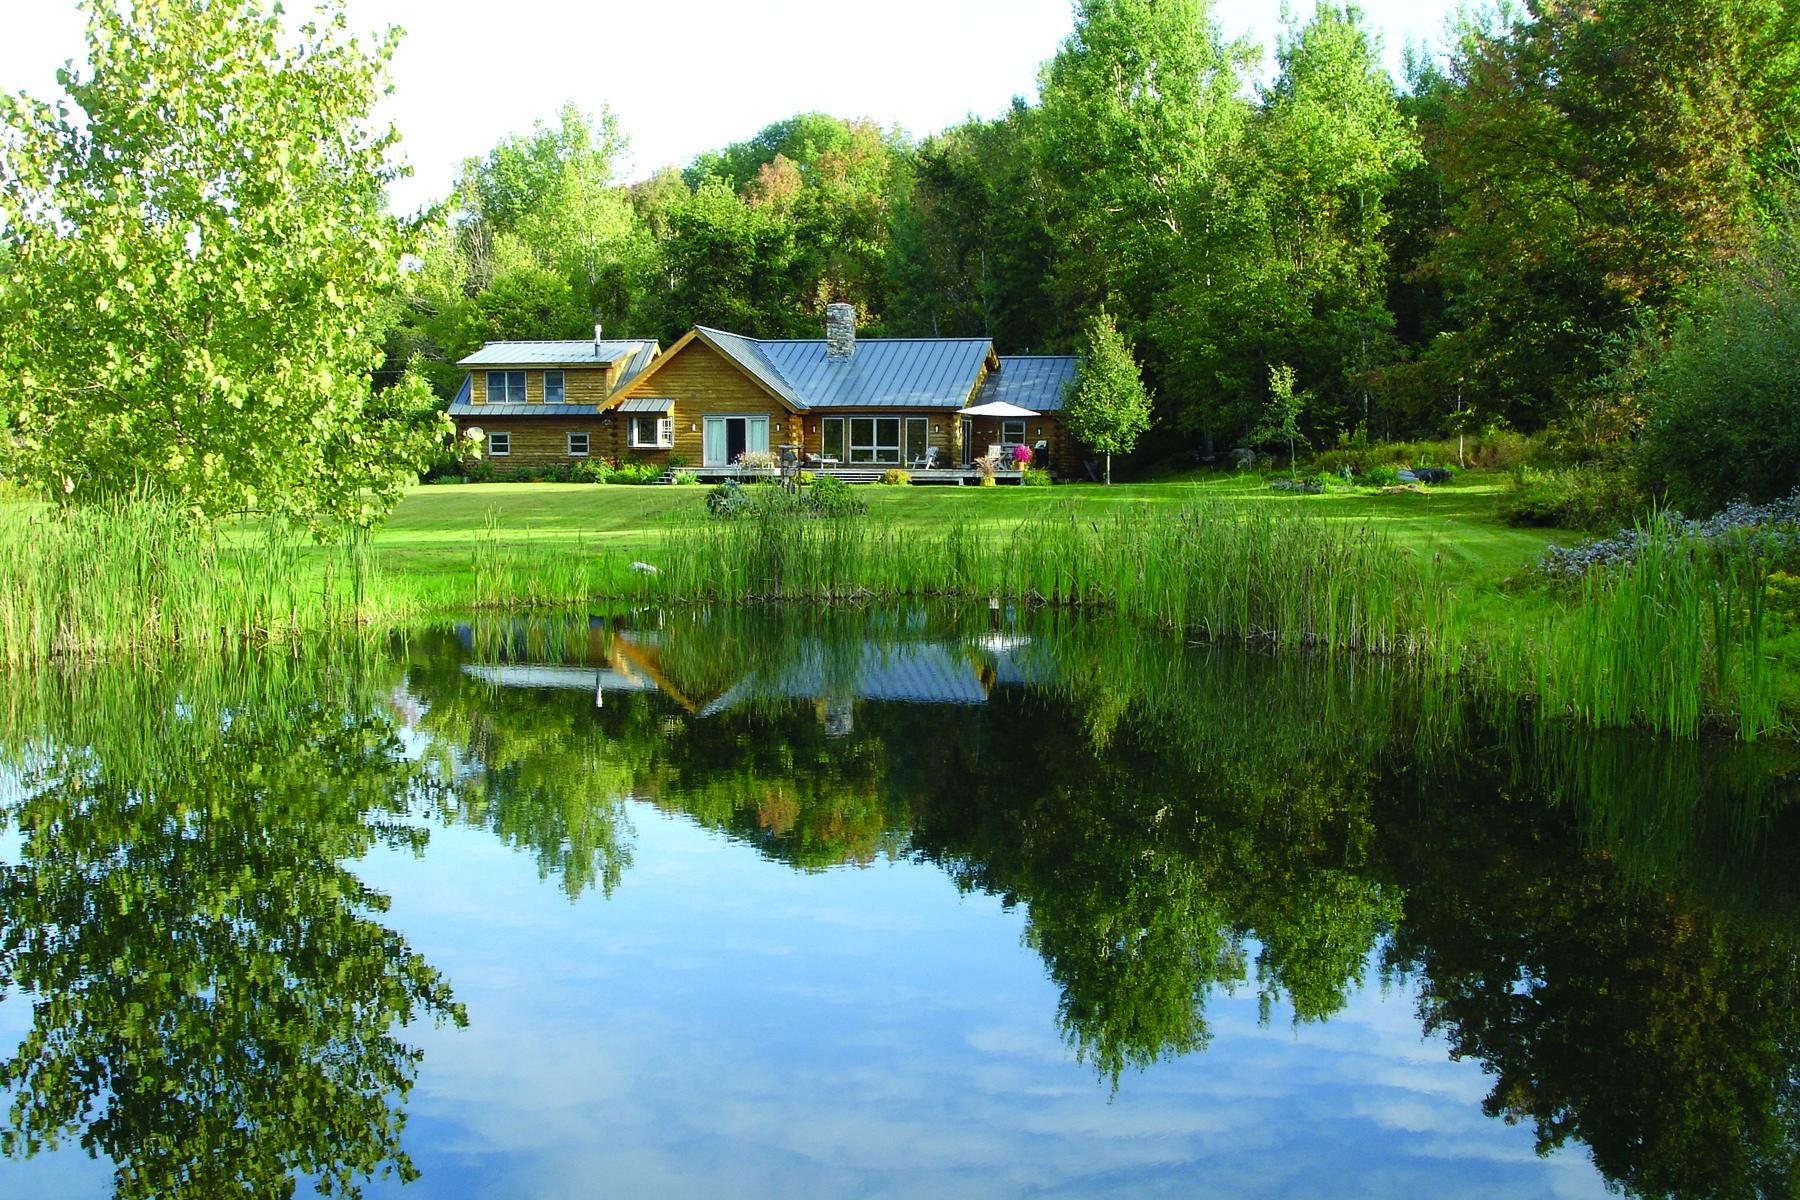 独户住宅 为 销售 在 Country Chic Log Home 55 Kelley Hill Rd 丹比, 佛蒙特州 05739 美国